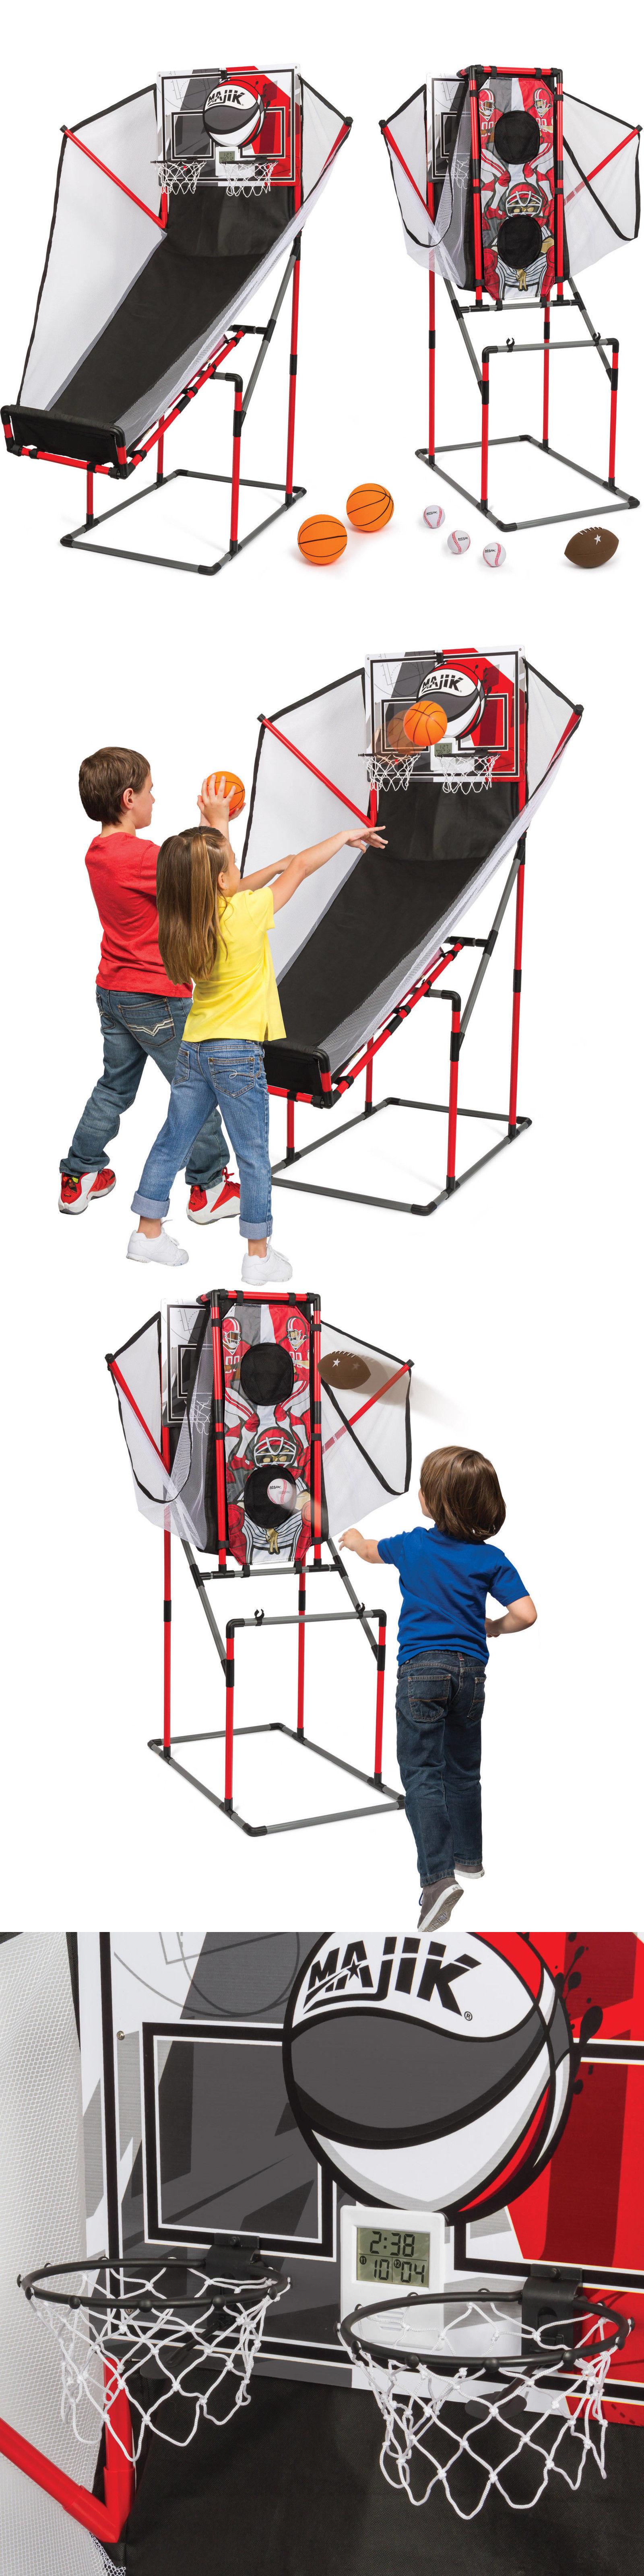 Other Indoor Games 36278: Arcade Sport Center Basketball Foo